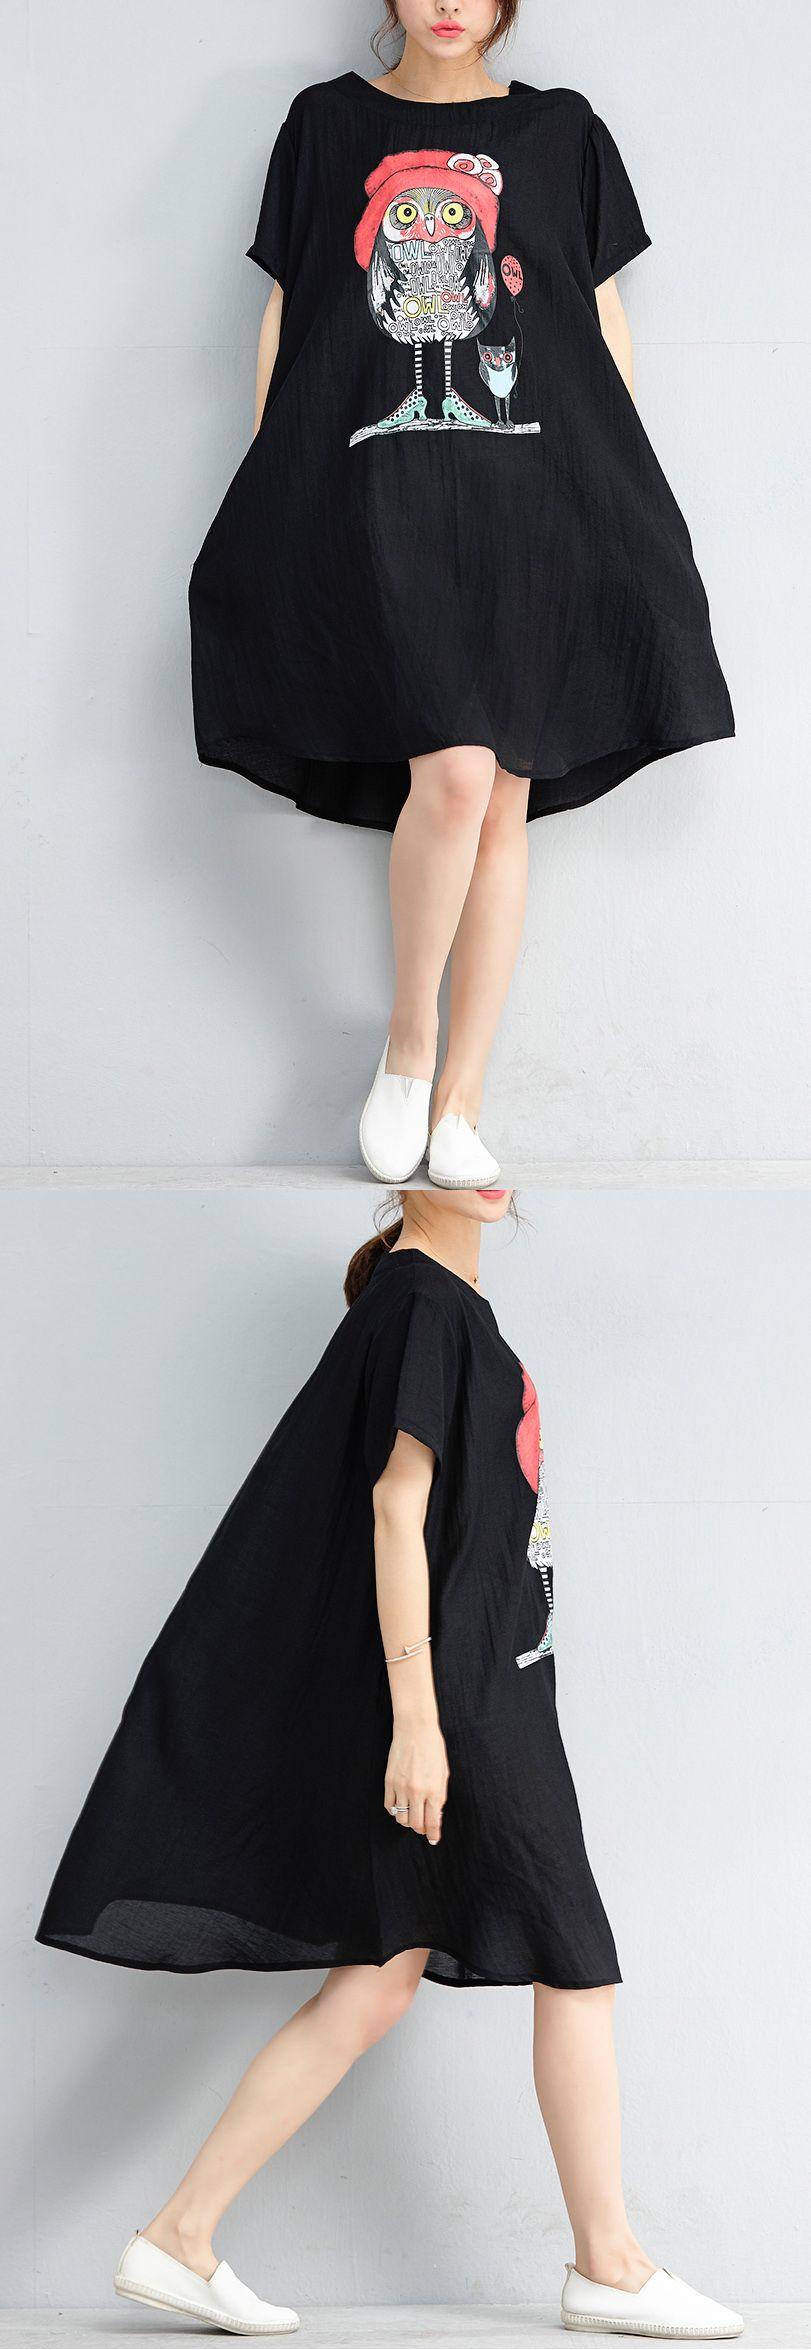 28d17887a1 2018 black chiffon shift shirt dress casual short sleeve Cartoon print dress